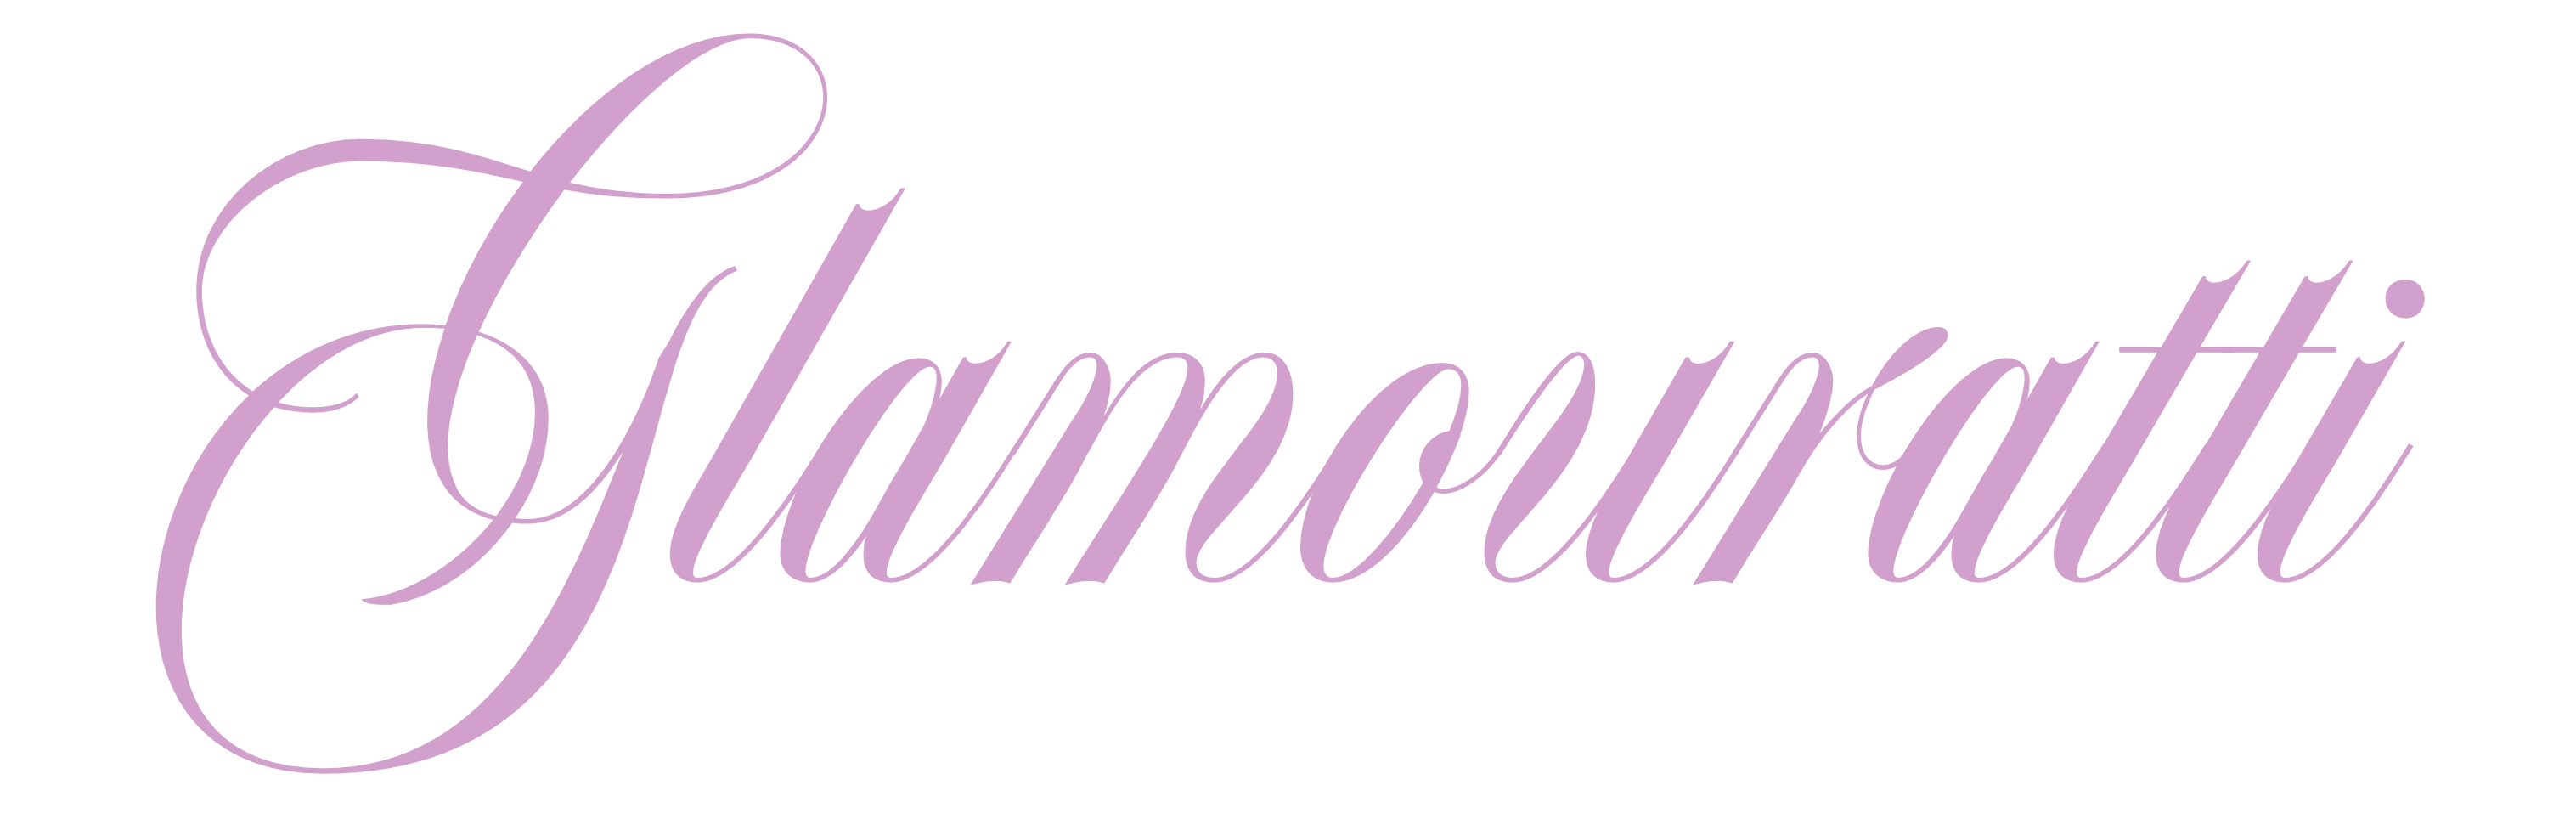 Glamouratti